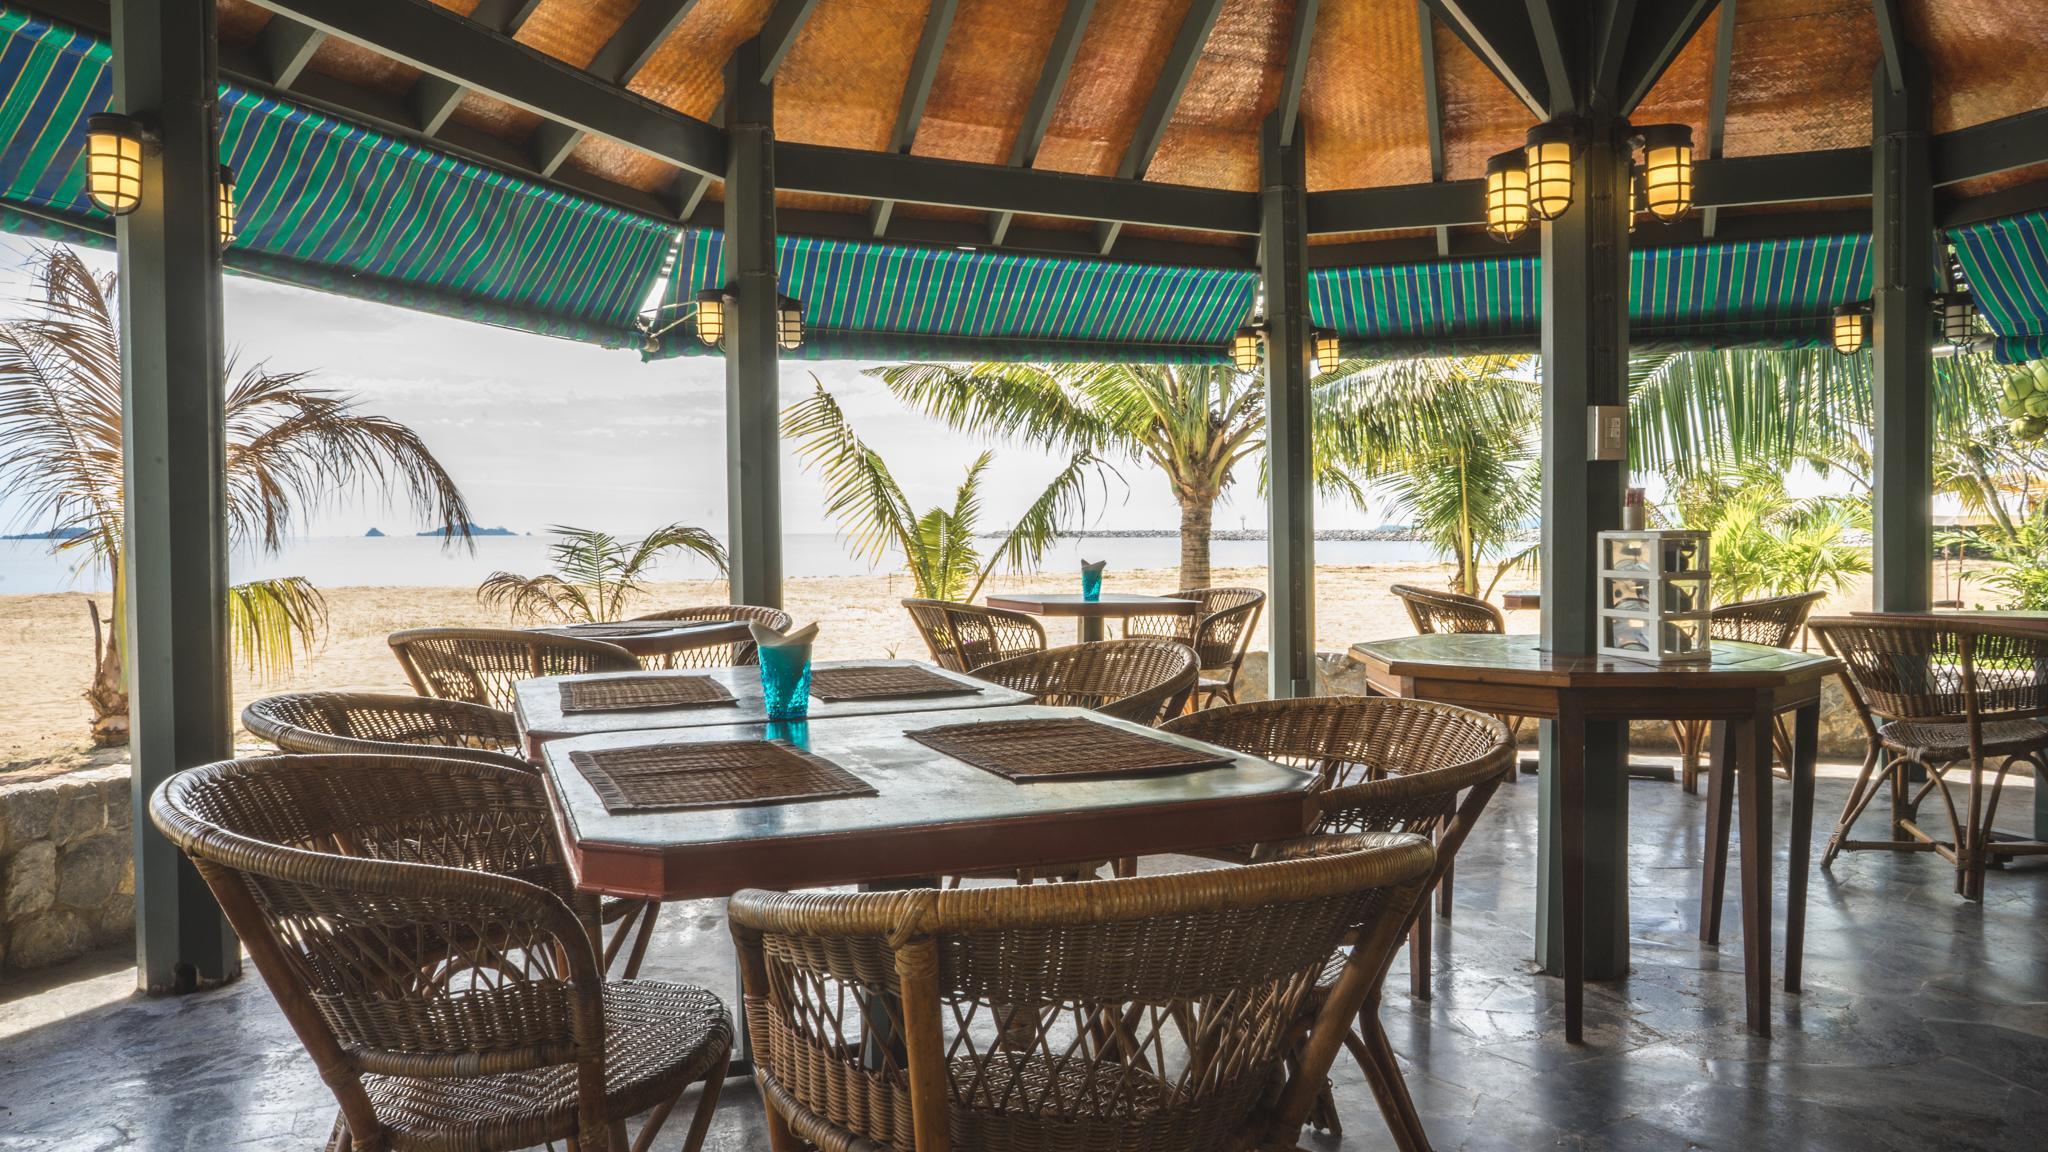 Beach restaurant Bann Pae Cabana